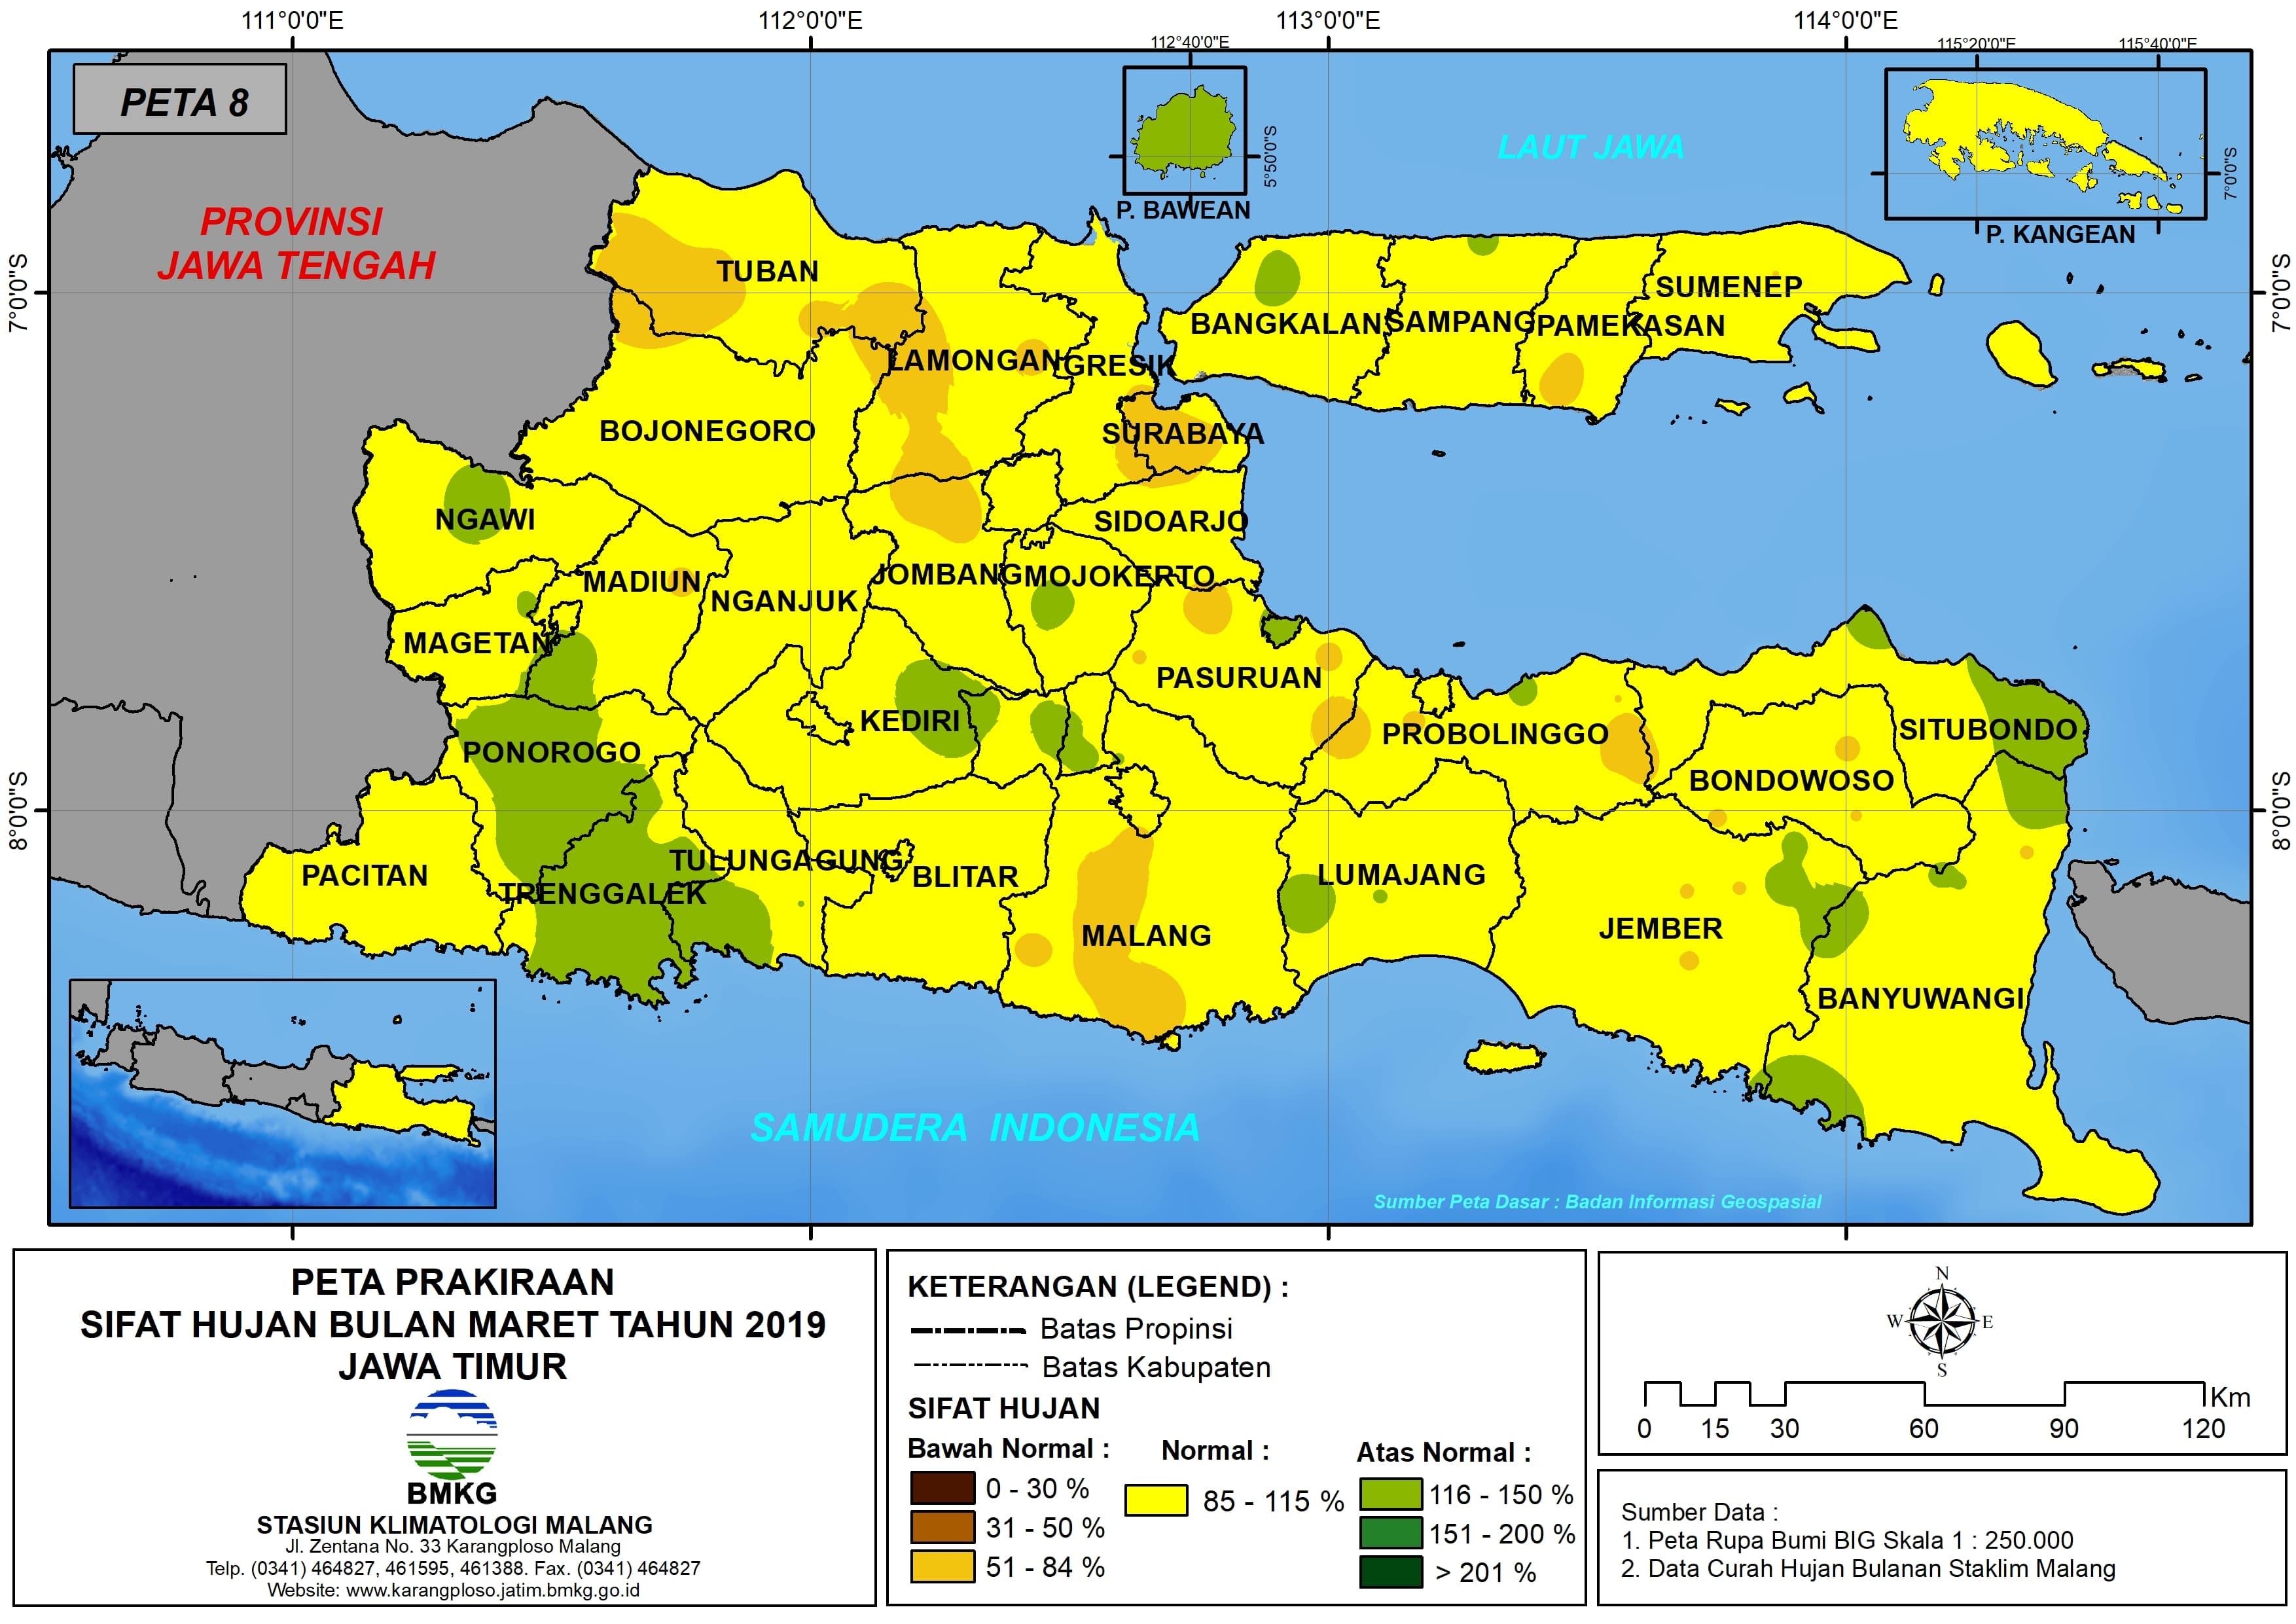 Prakiraan Sifat Hujan Bulan Maret Tahun 2018 di Provinsi Jawa Timur Update dari Analisis Bulan November 2018